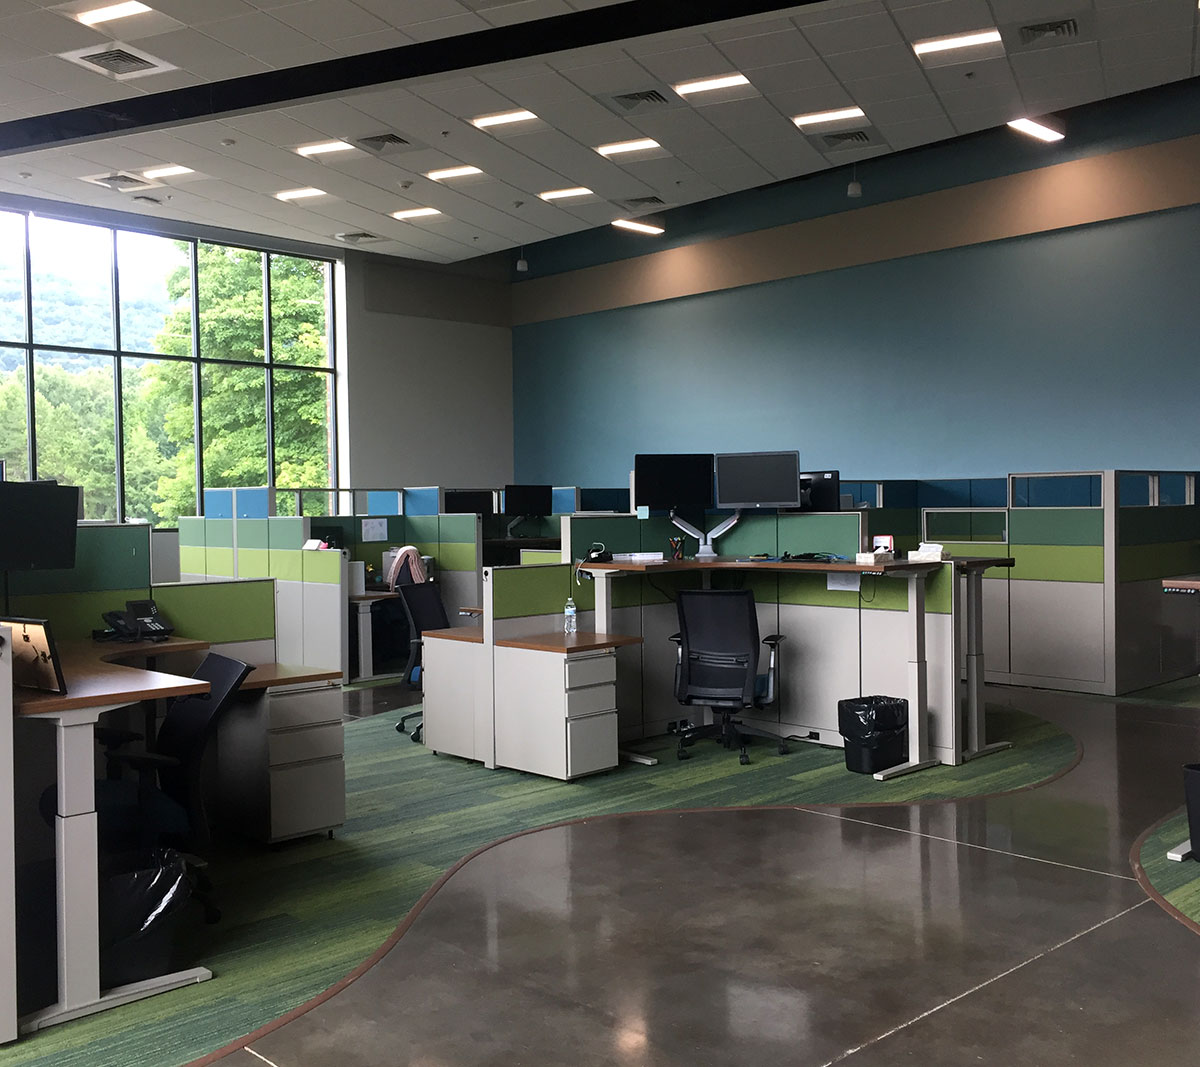 e911 Communication Center workspace